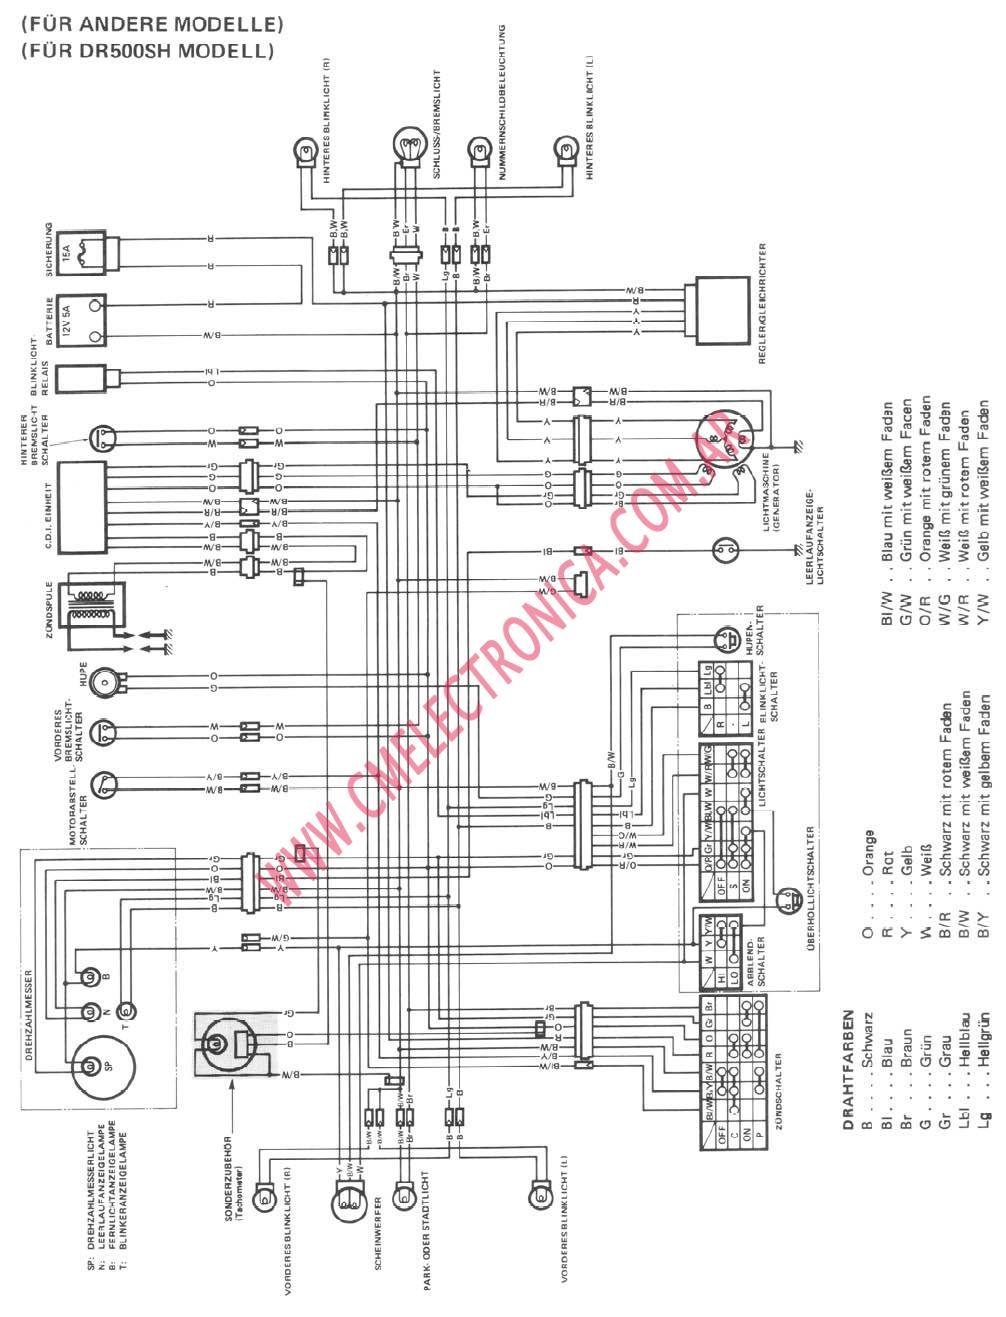 Suzuki katana wiring diagram imageresizertool